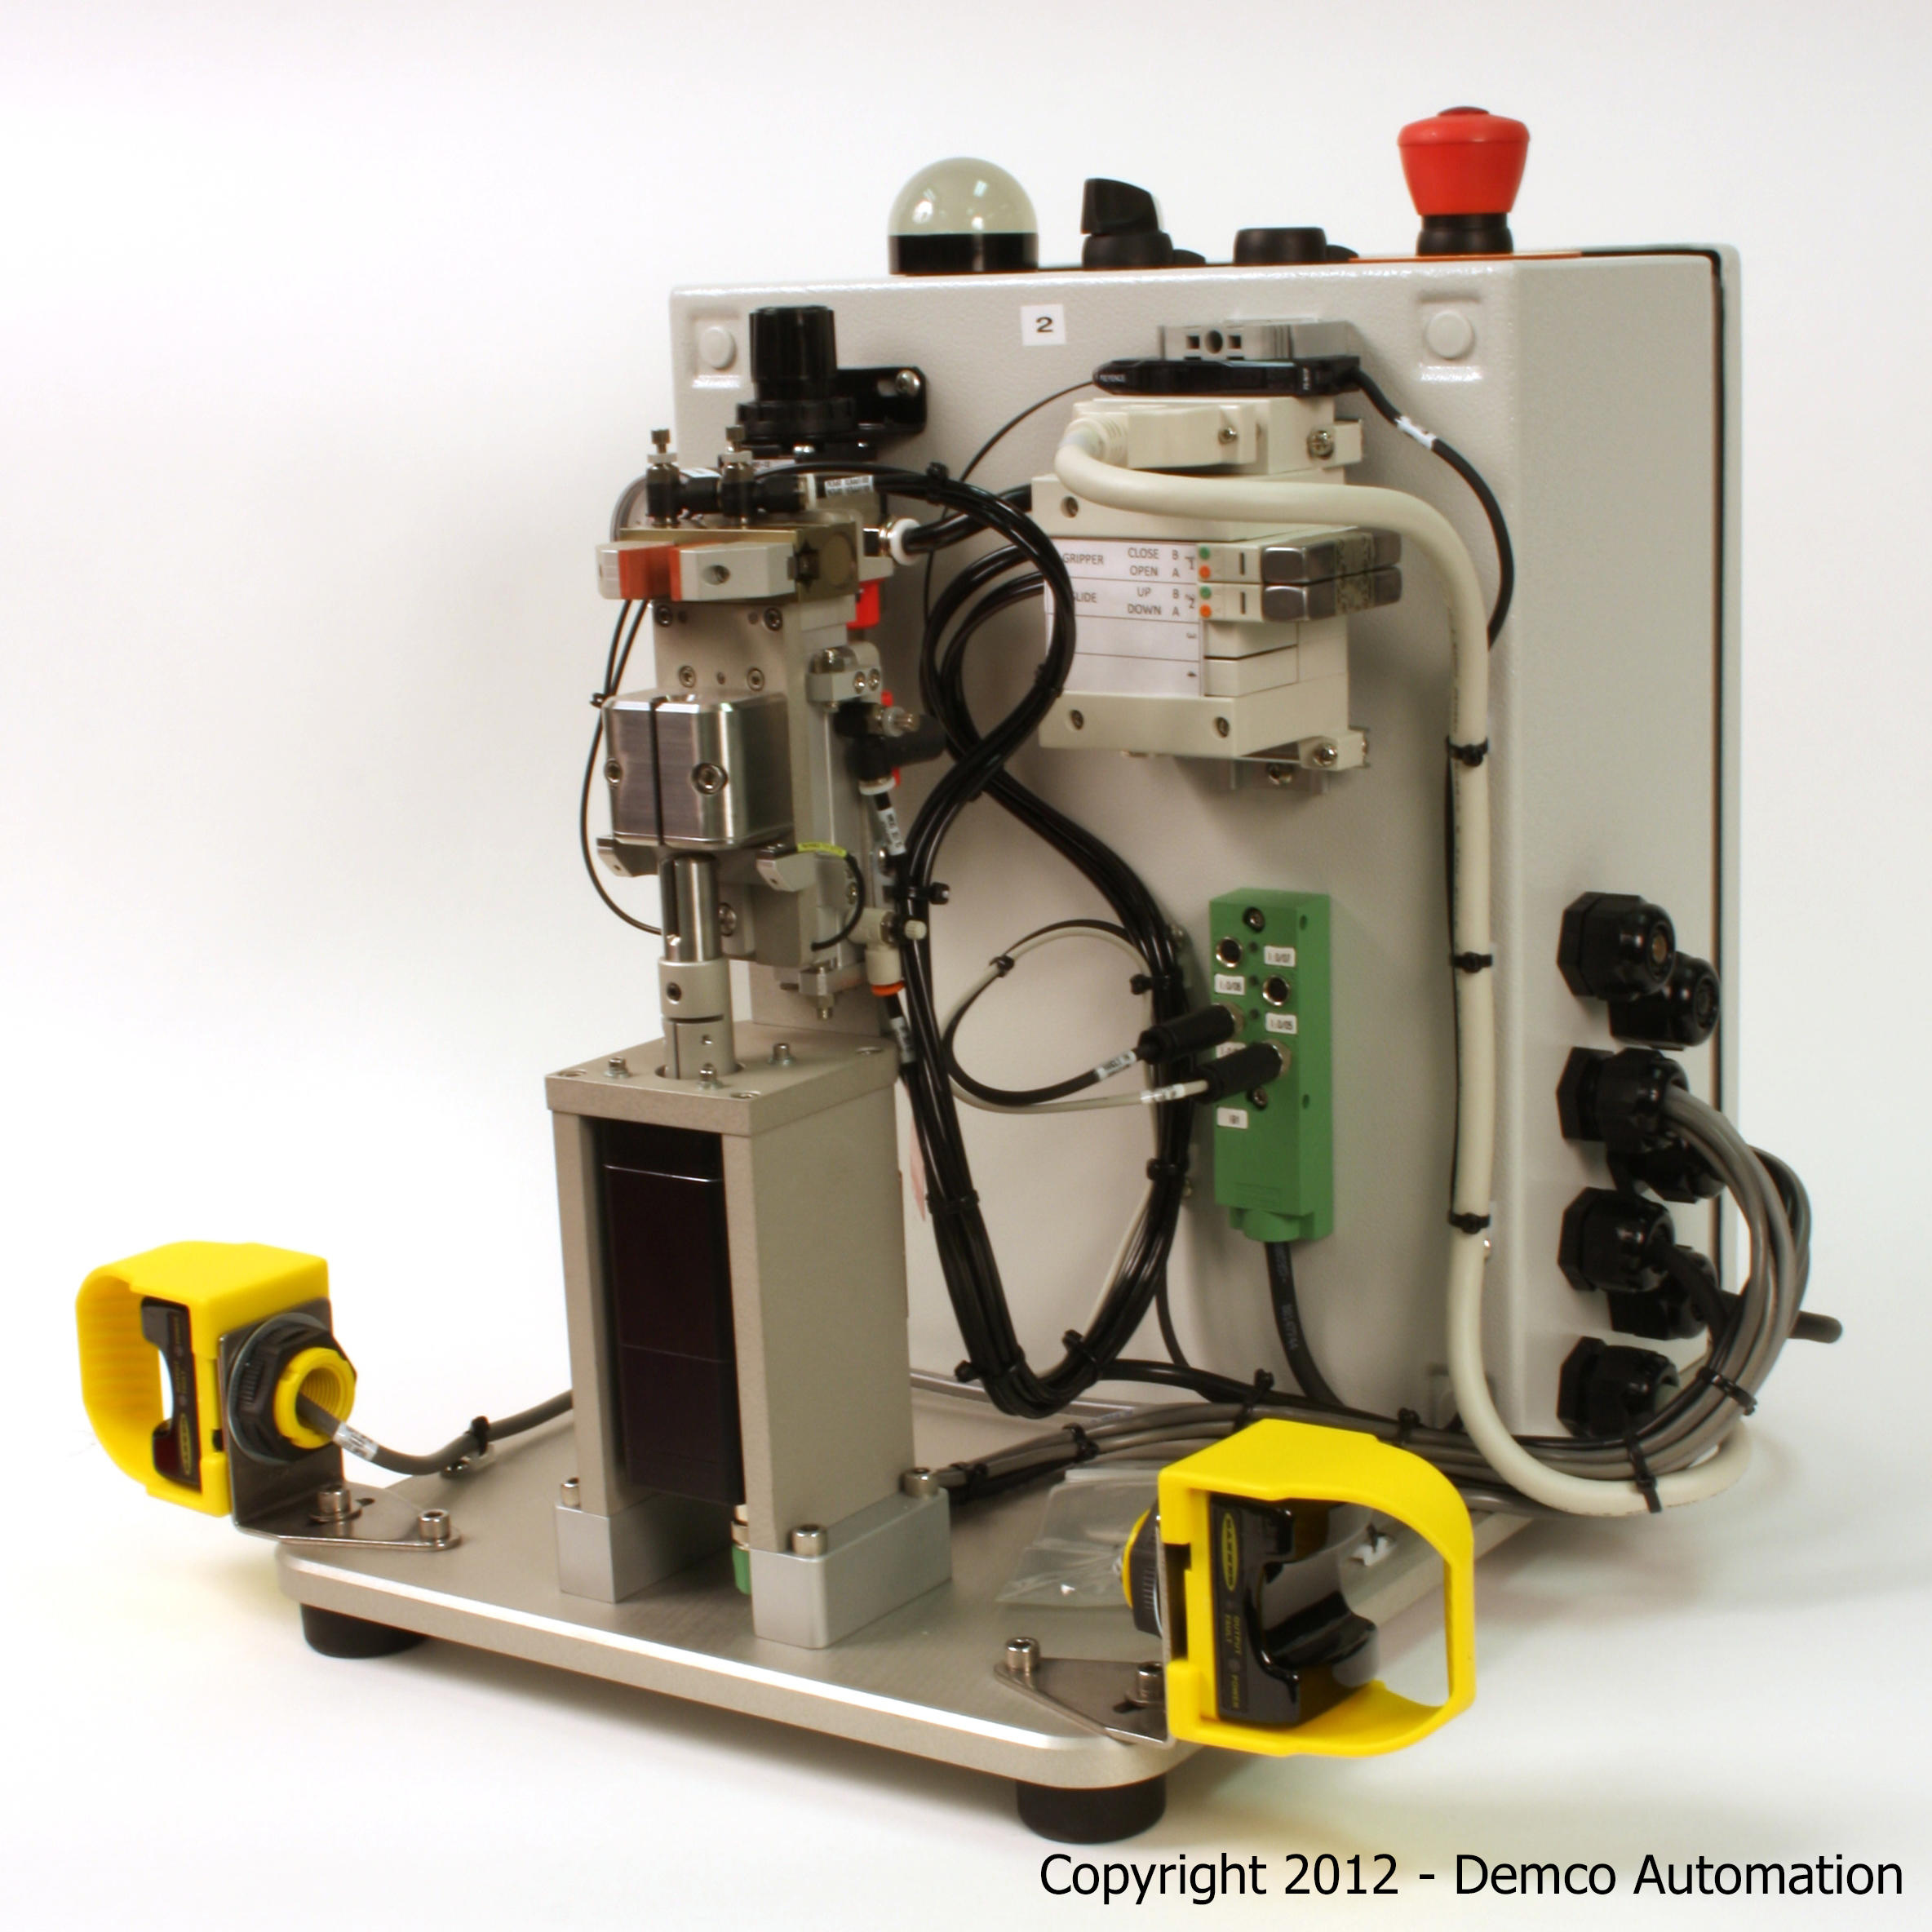 Demco Automation image 3